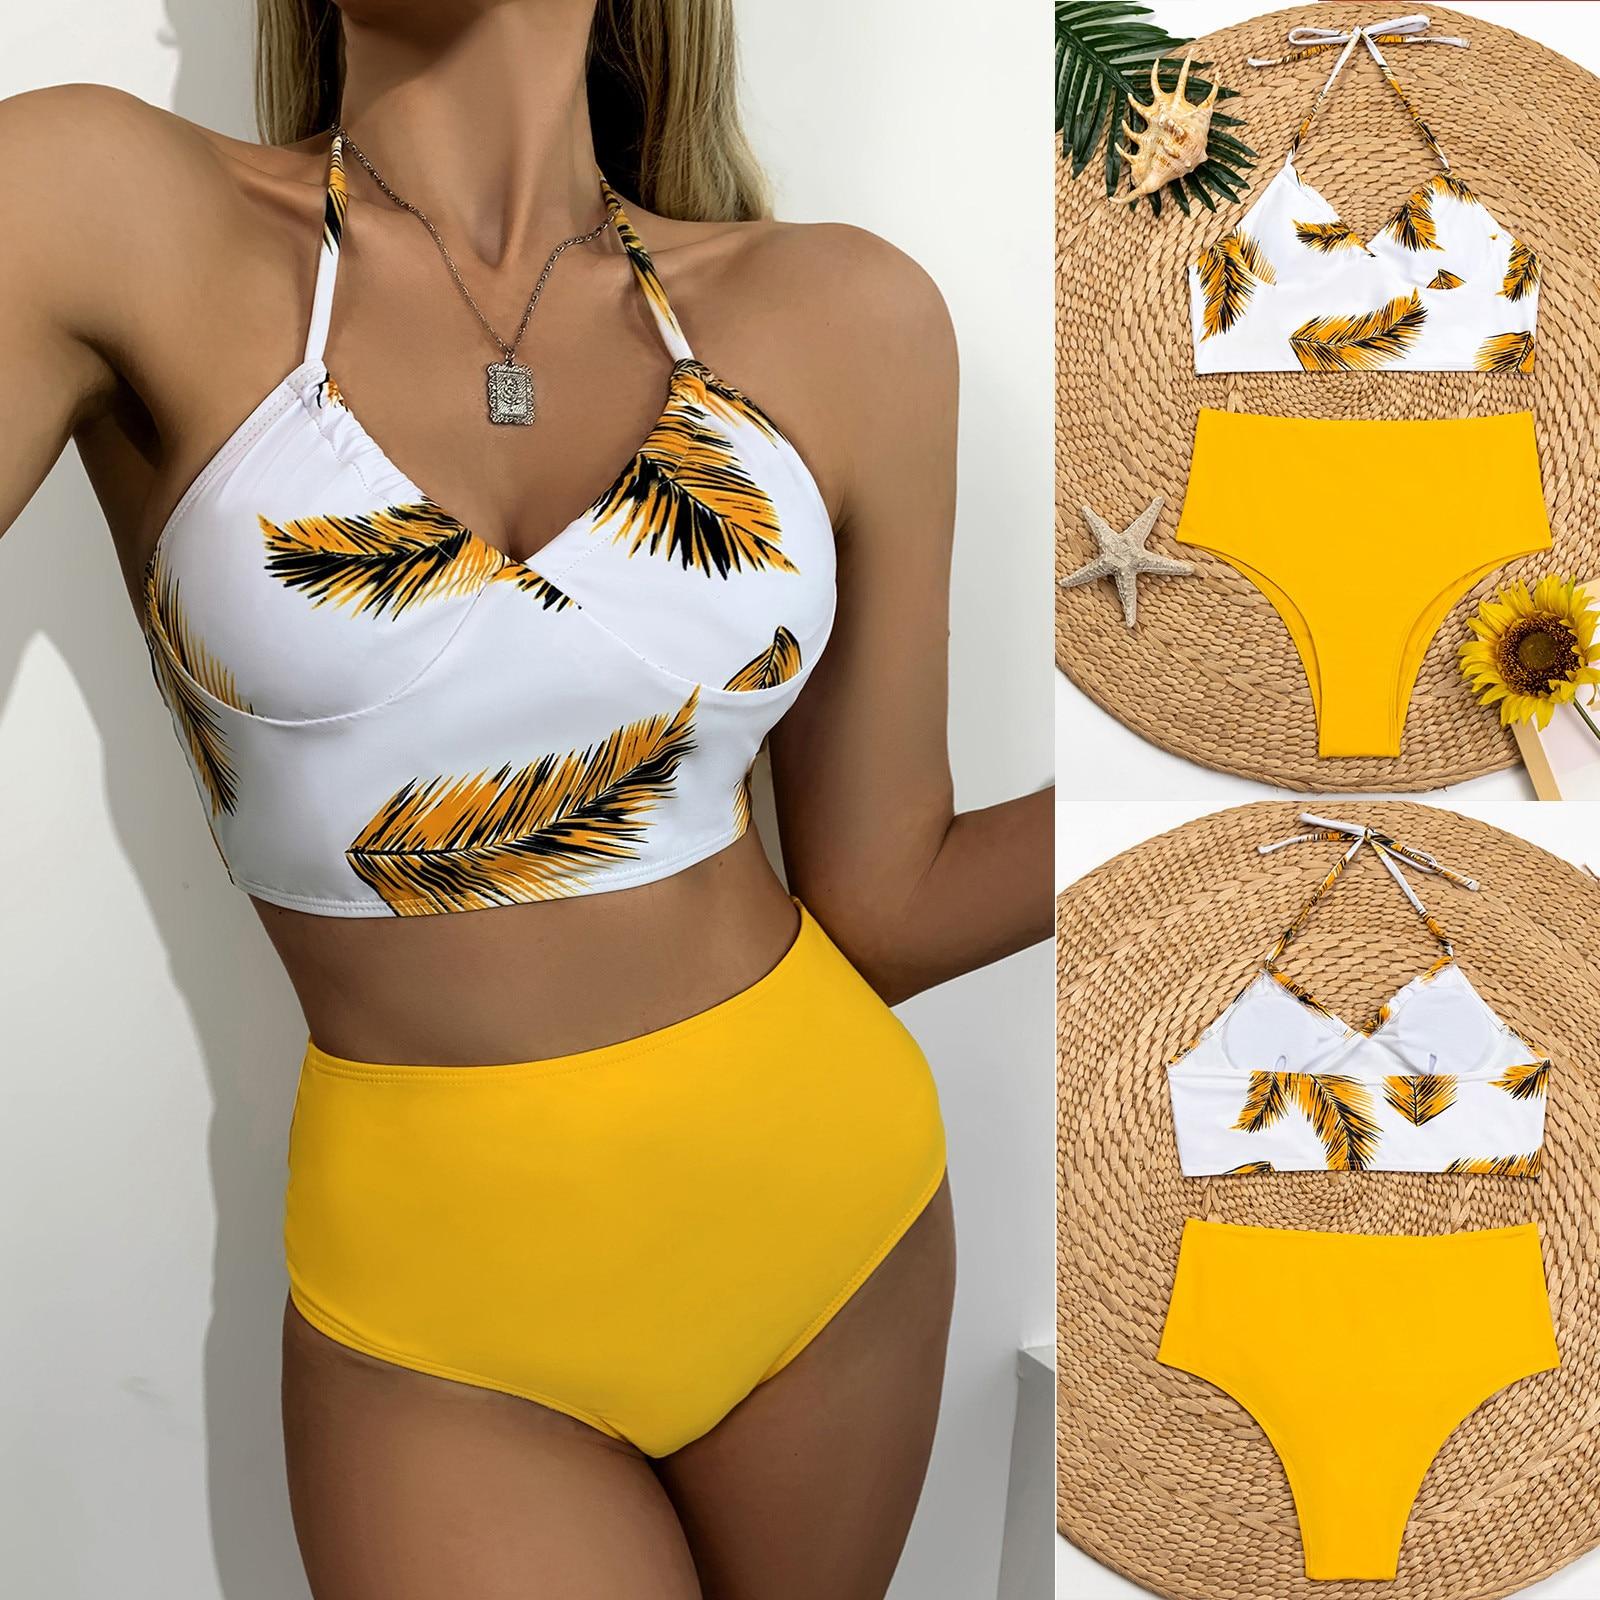 Einfache frauen Straping Druck Nähte Split Badeanzug Sexy Bademode costumi da bagno donna bikini Haut-freundliche mode F4